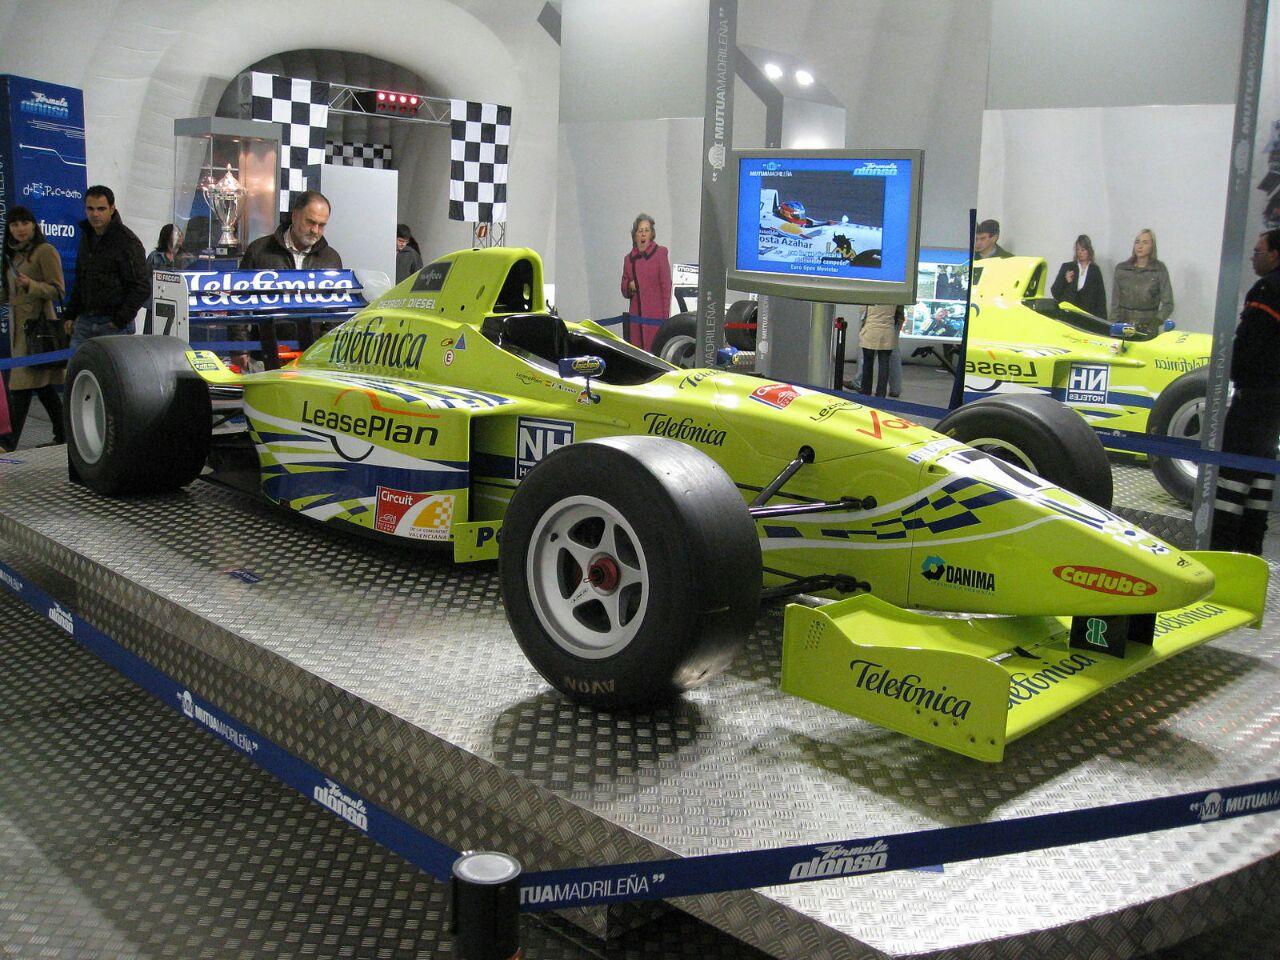 ماشین فرناندو آلونسو در مسابقات فرمول 3000